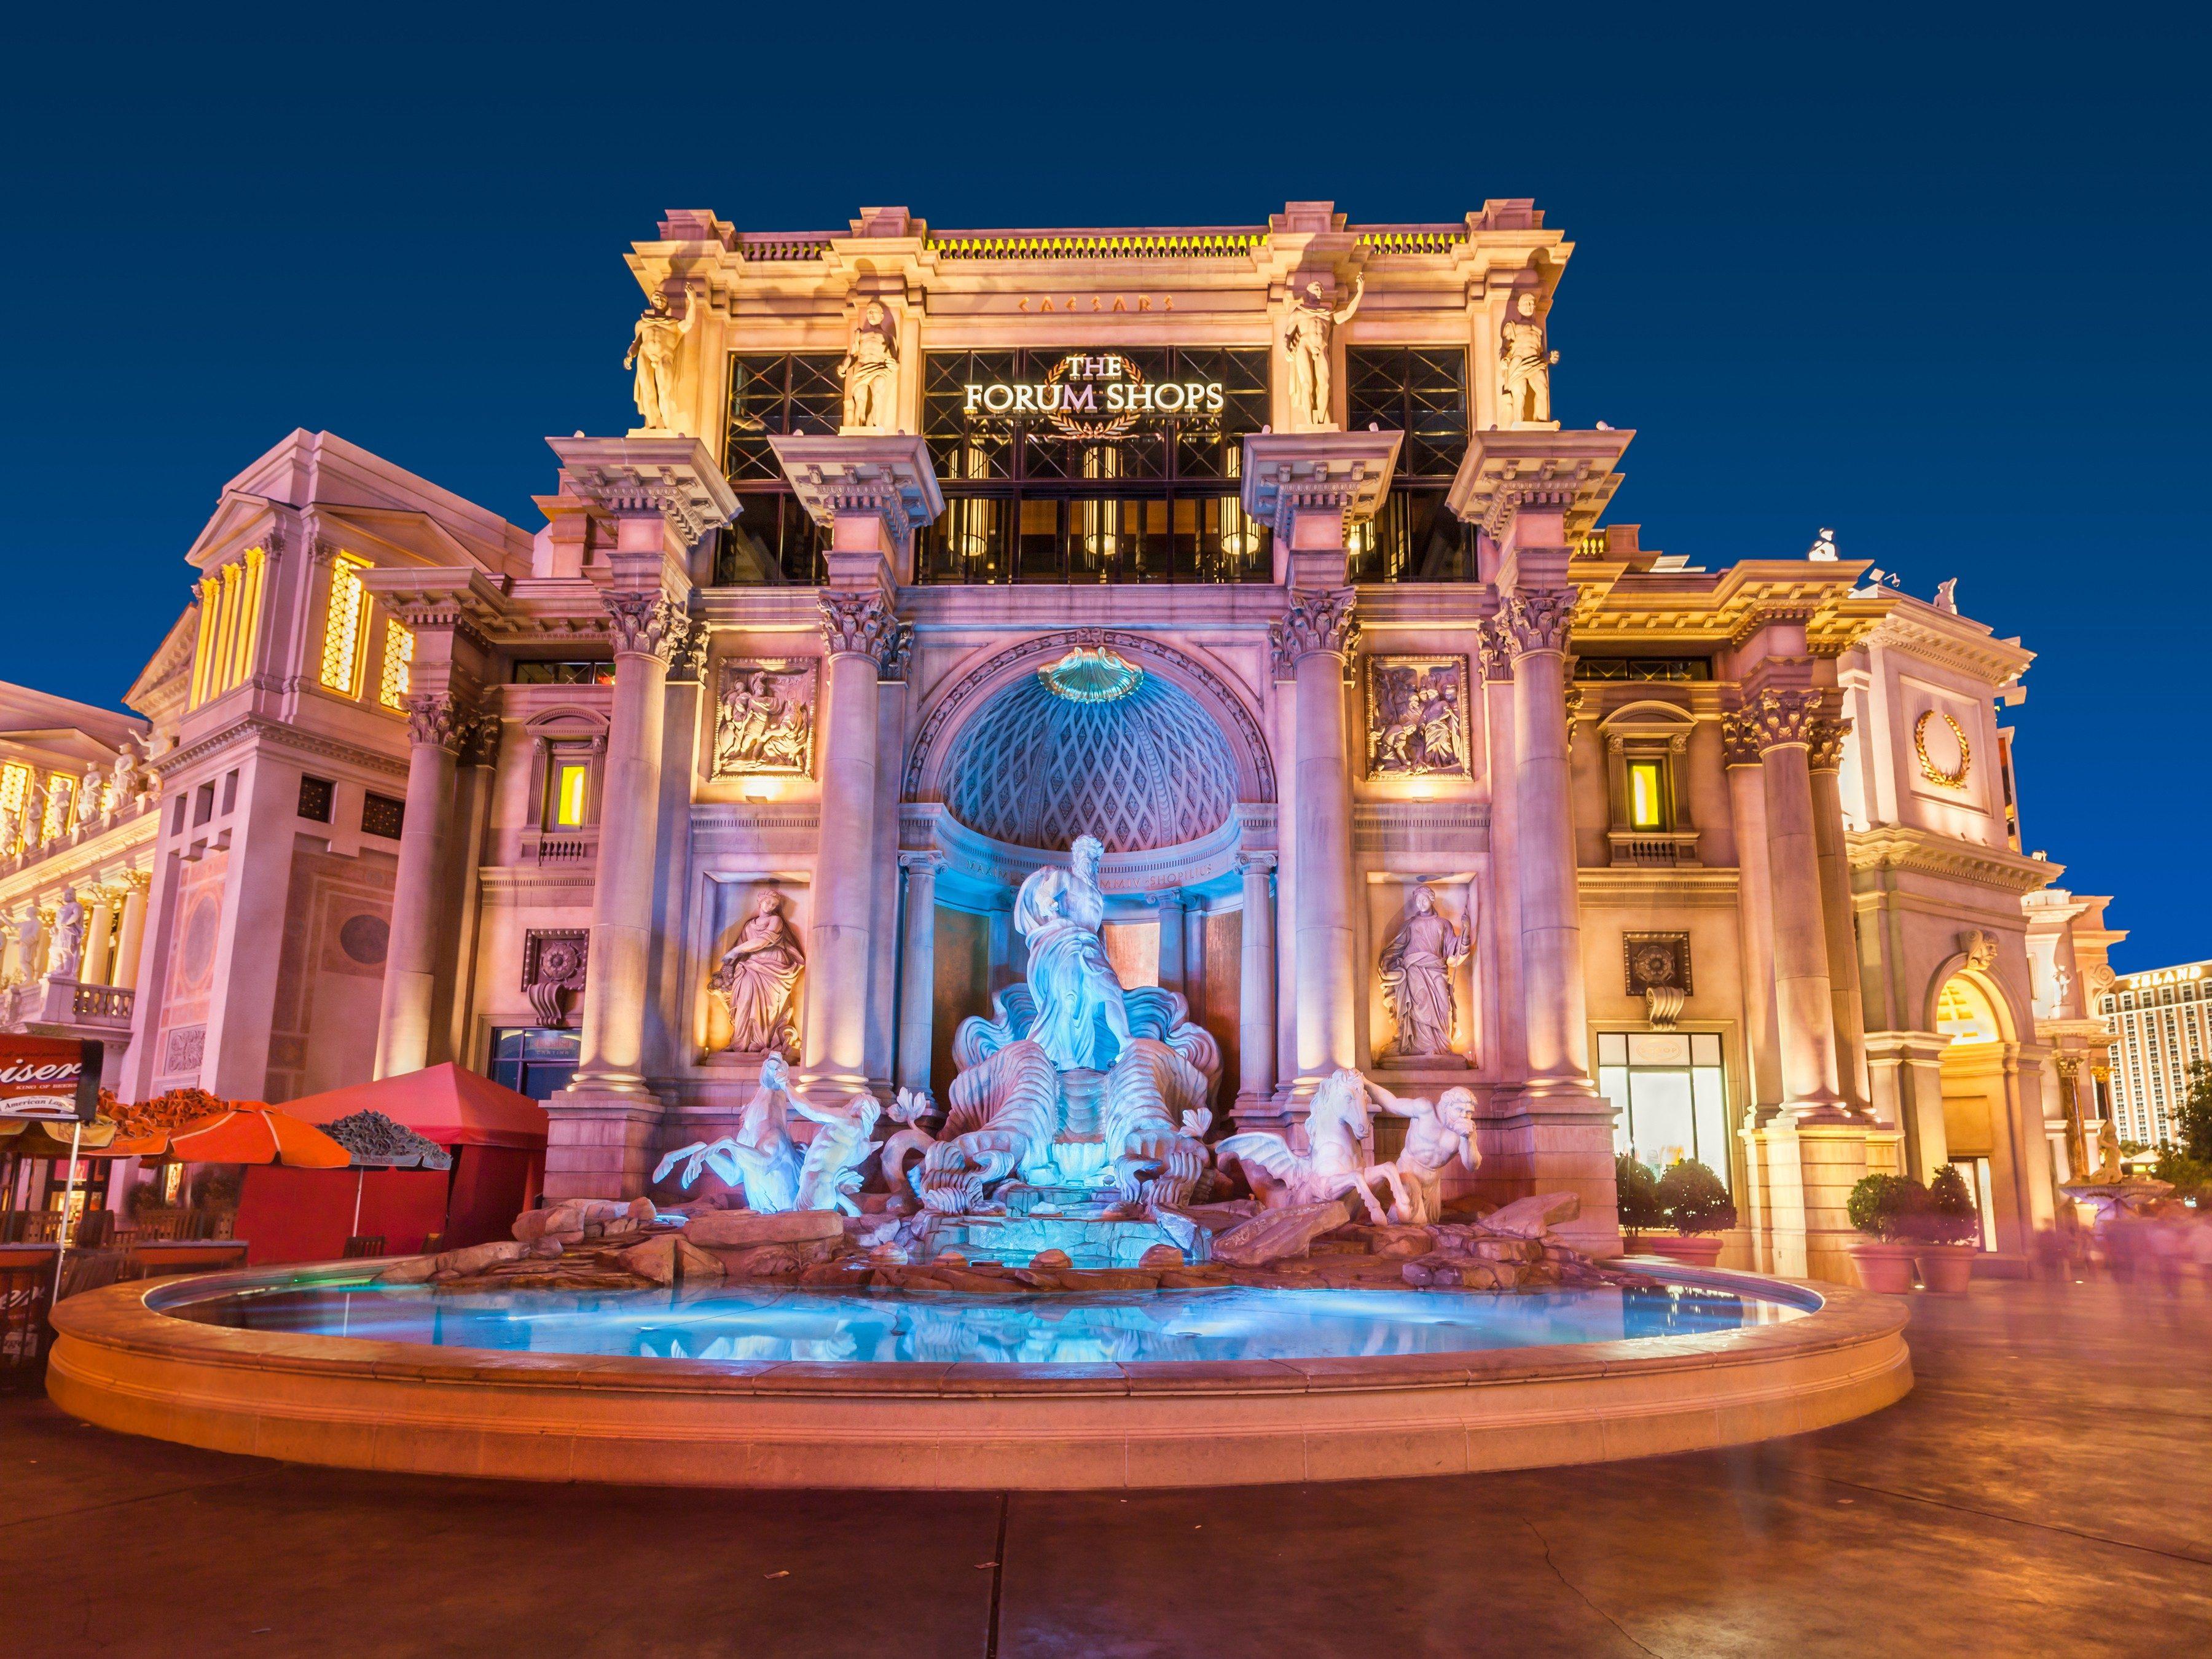 10 Amazing Reasons to Visit Las Vegas: The Forum Shops at Caesars